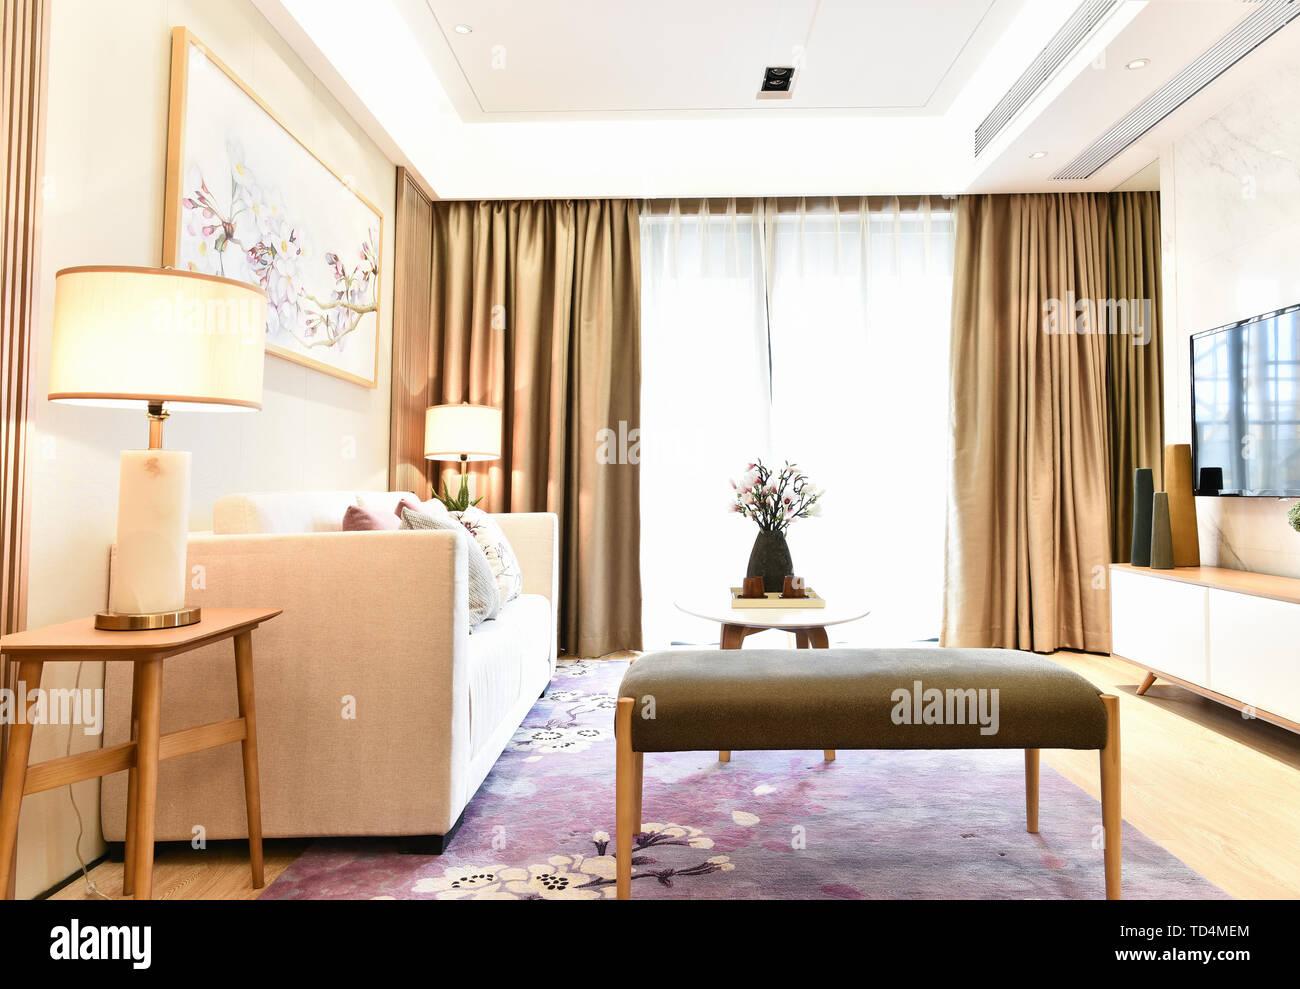 Modern Minimalist Home Floor To Ceiling Windows Living Room Study Bedroom Design Stock Photo Alamy